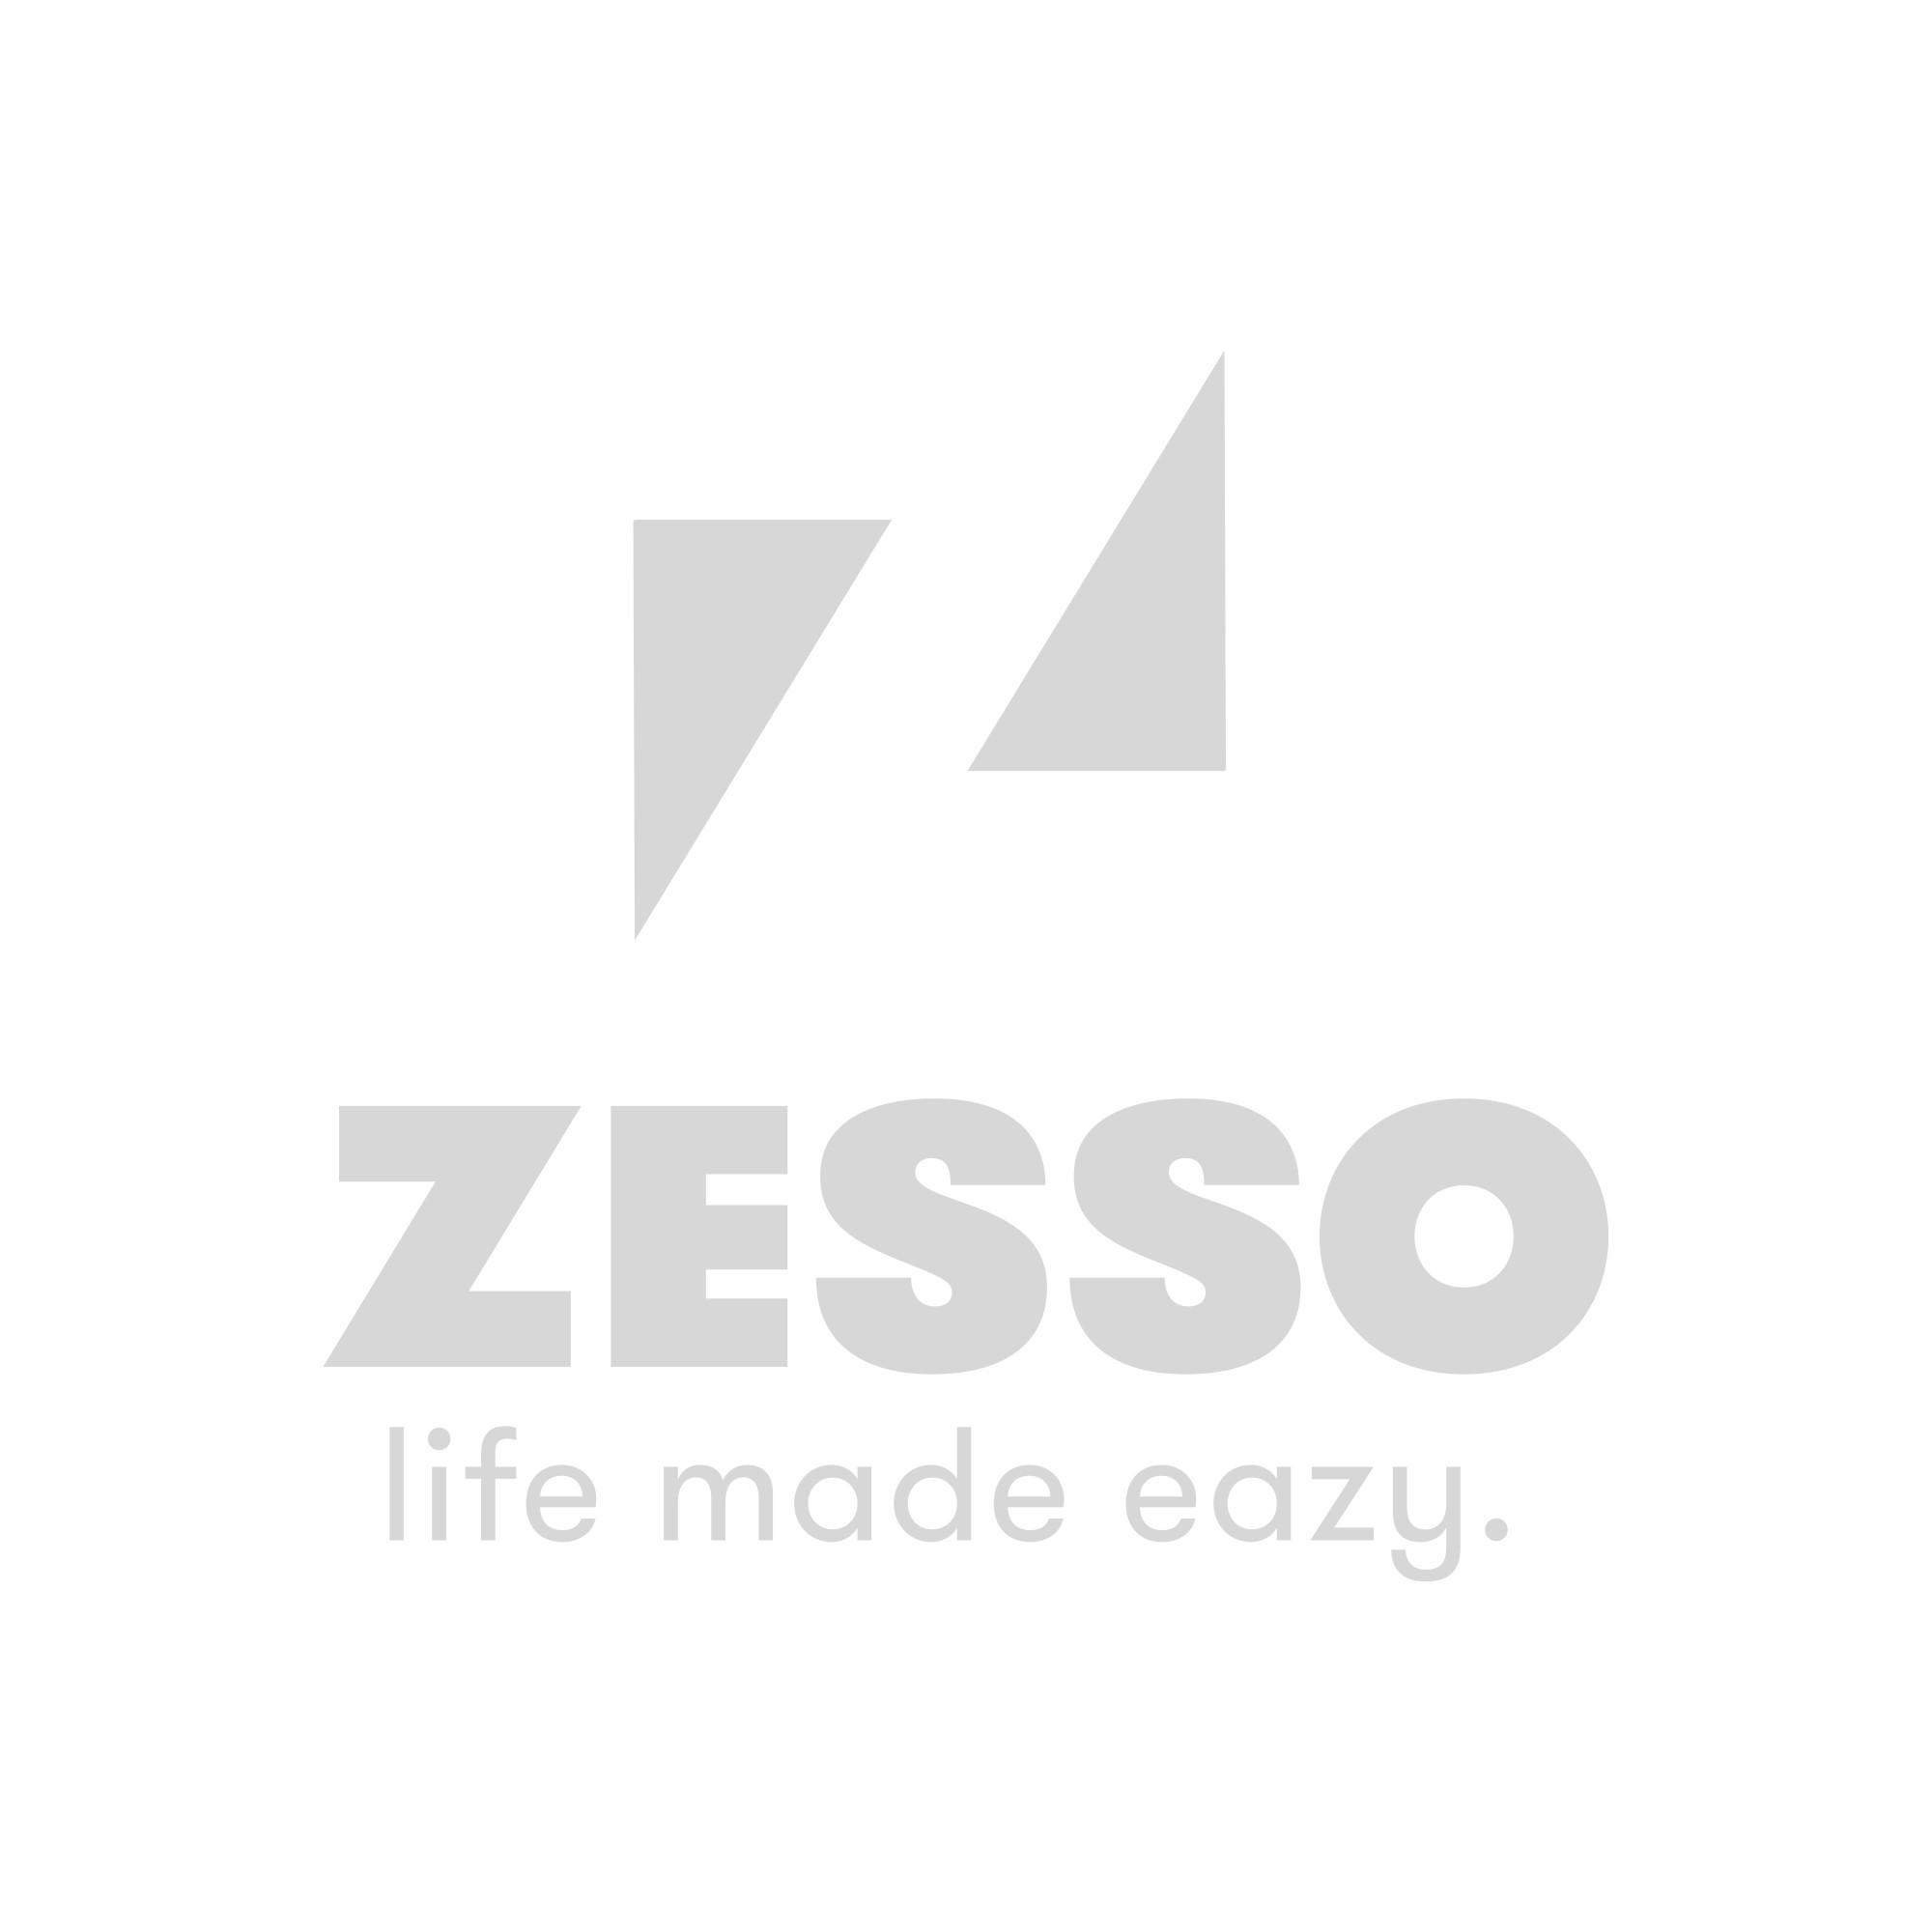 Kinderkamer Organizers